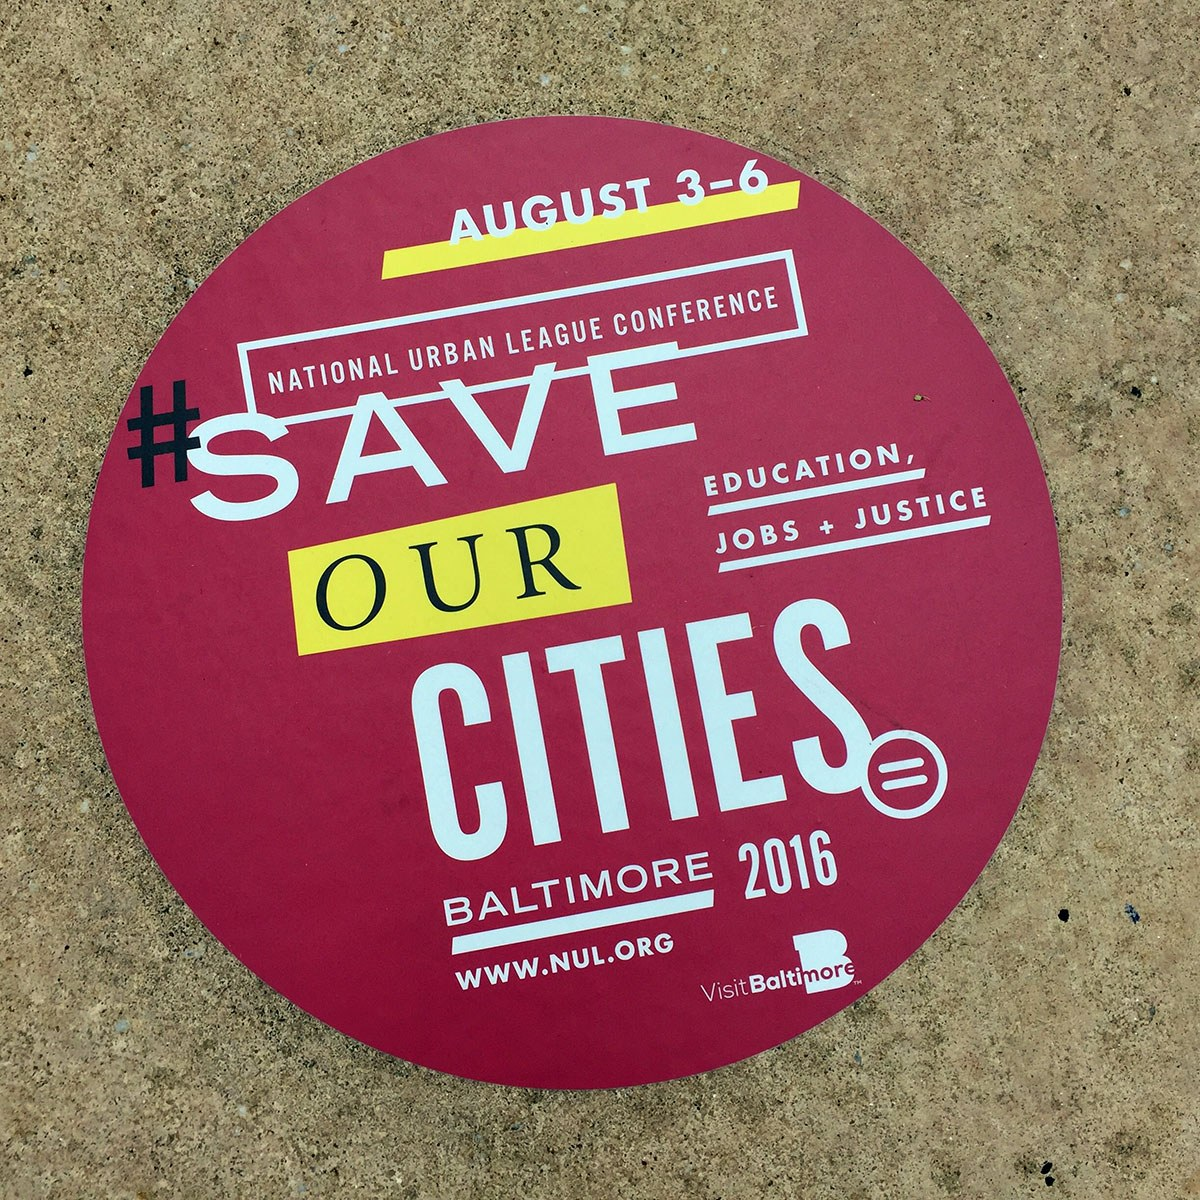 Nul Conference Baltimore Sidewalk Signage